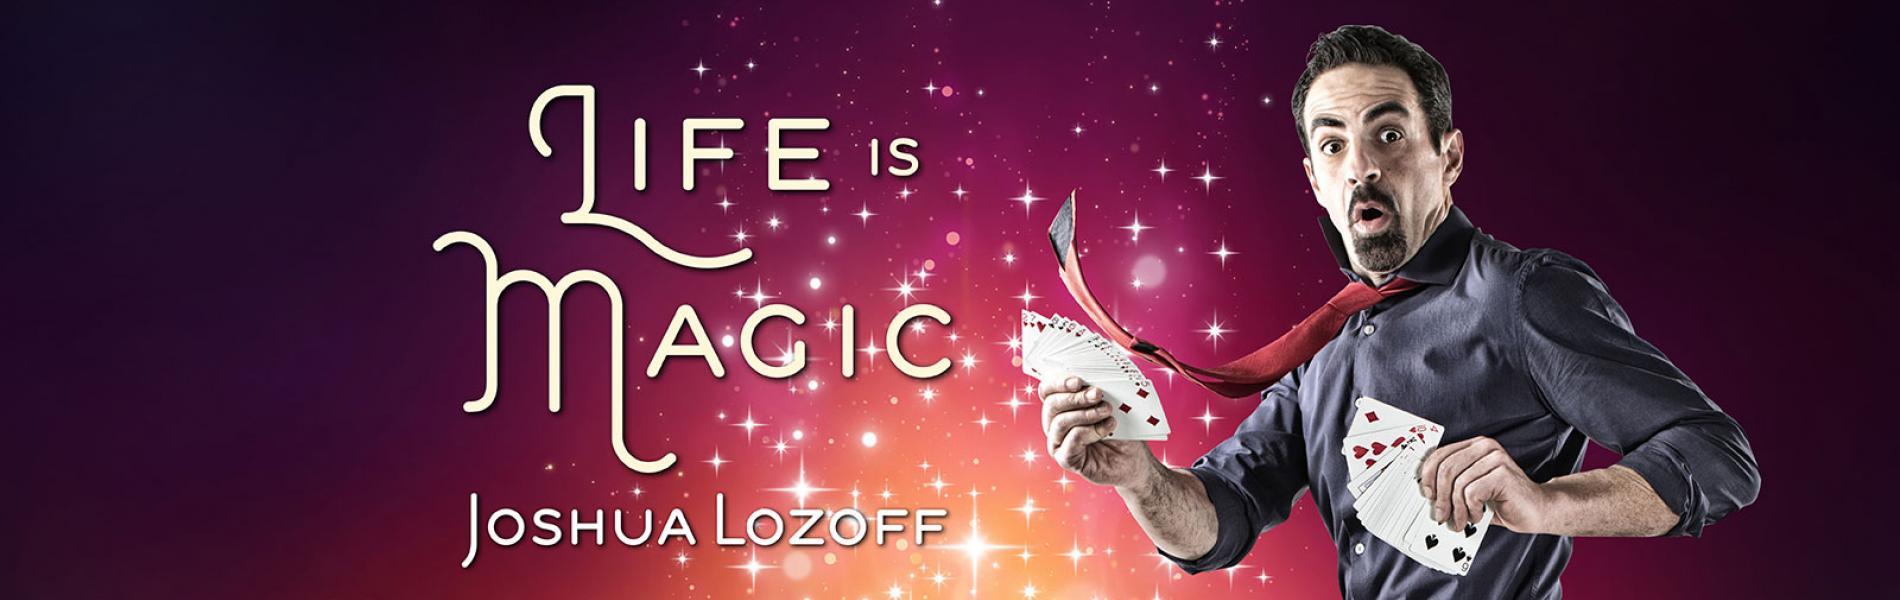 Joshua Lozoff - Life is Magic!